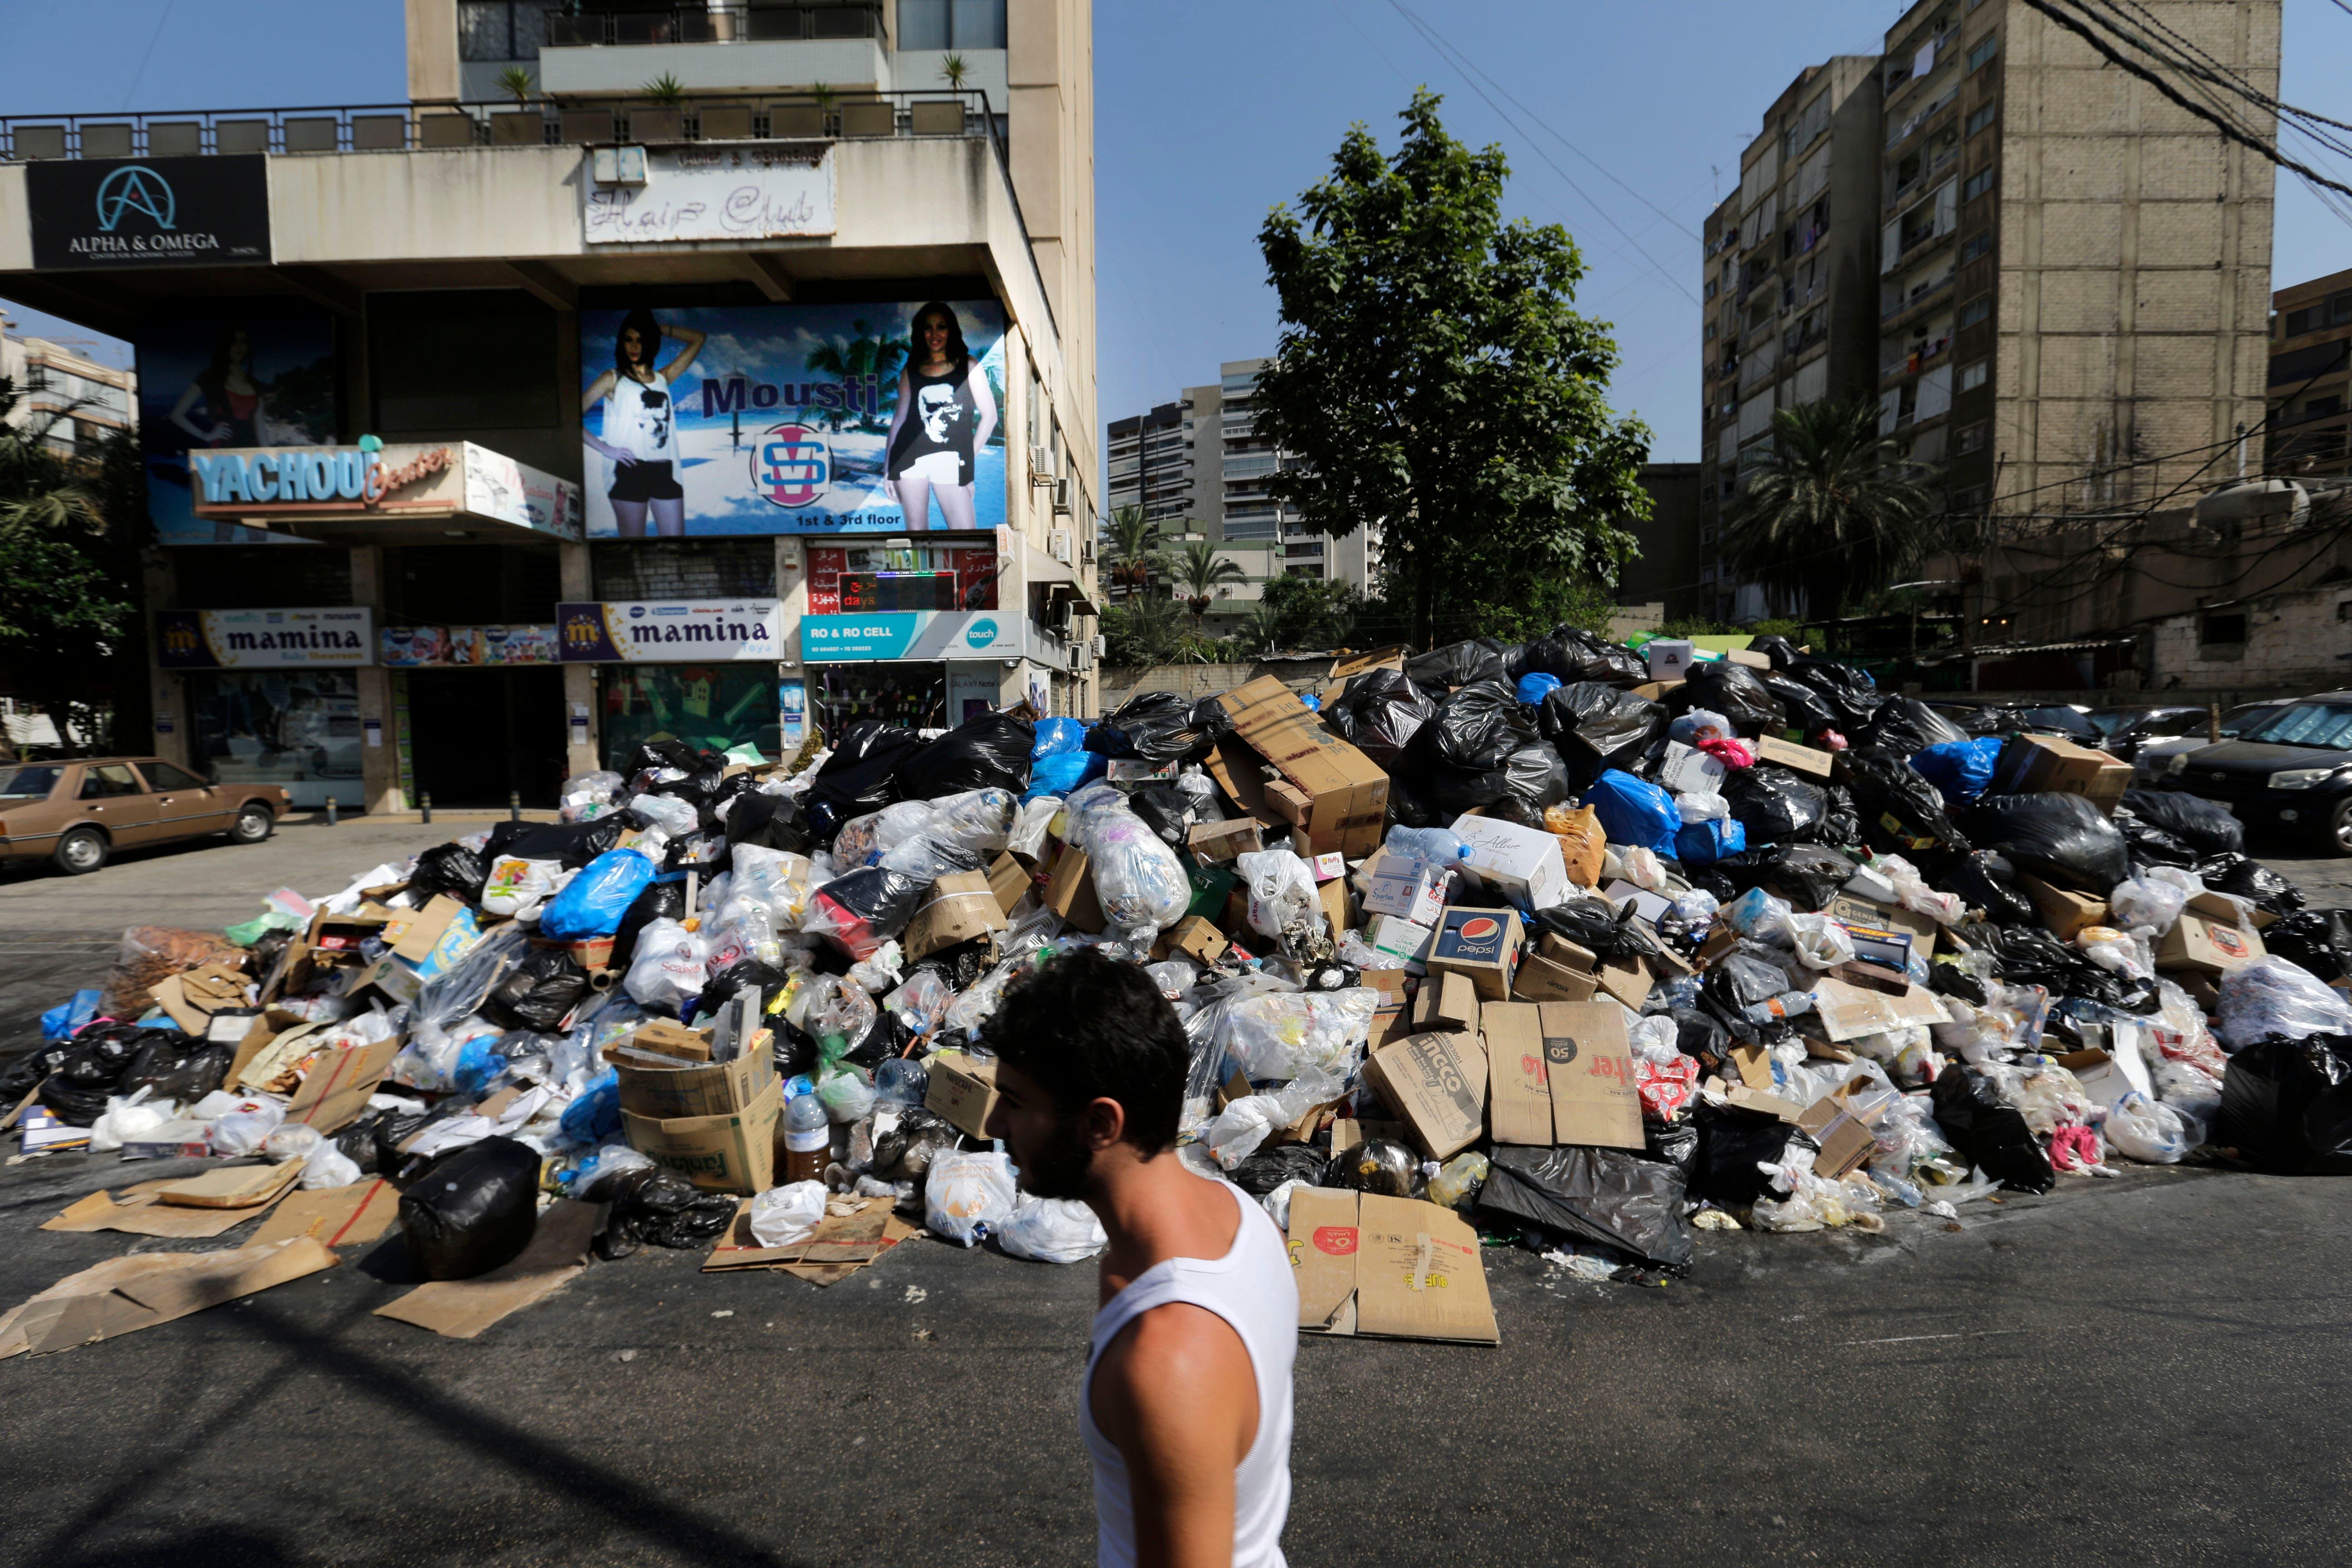 A Lebanese man passes a pile of garbage blocking a street in east Beirut, Lebanon, Monday, Aug. 17, 2015. AP